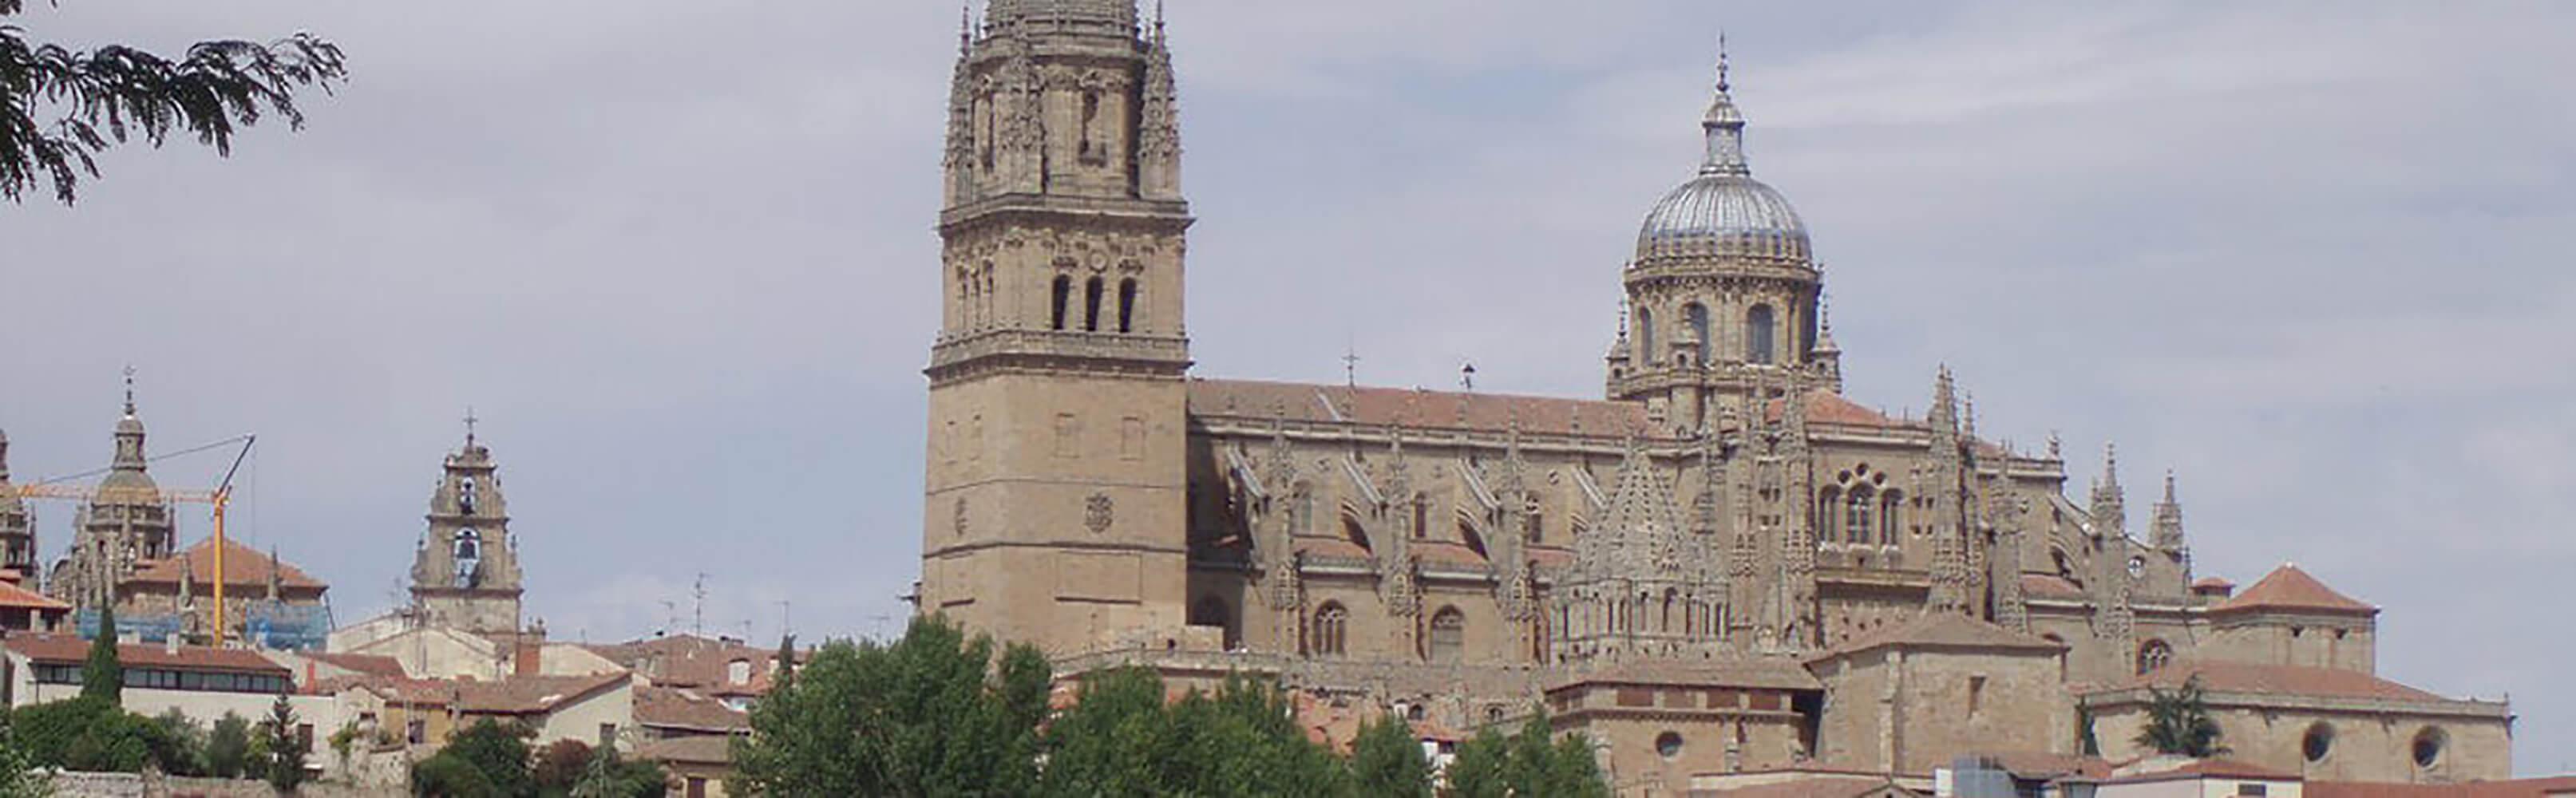 Catedrales de Salamanca 1